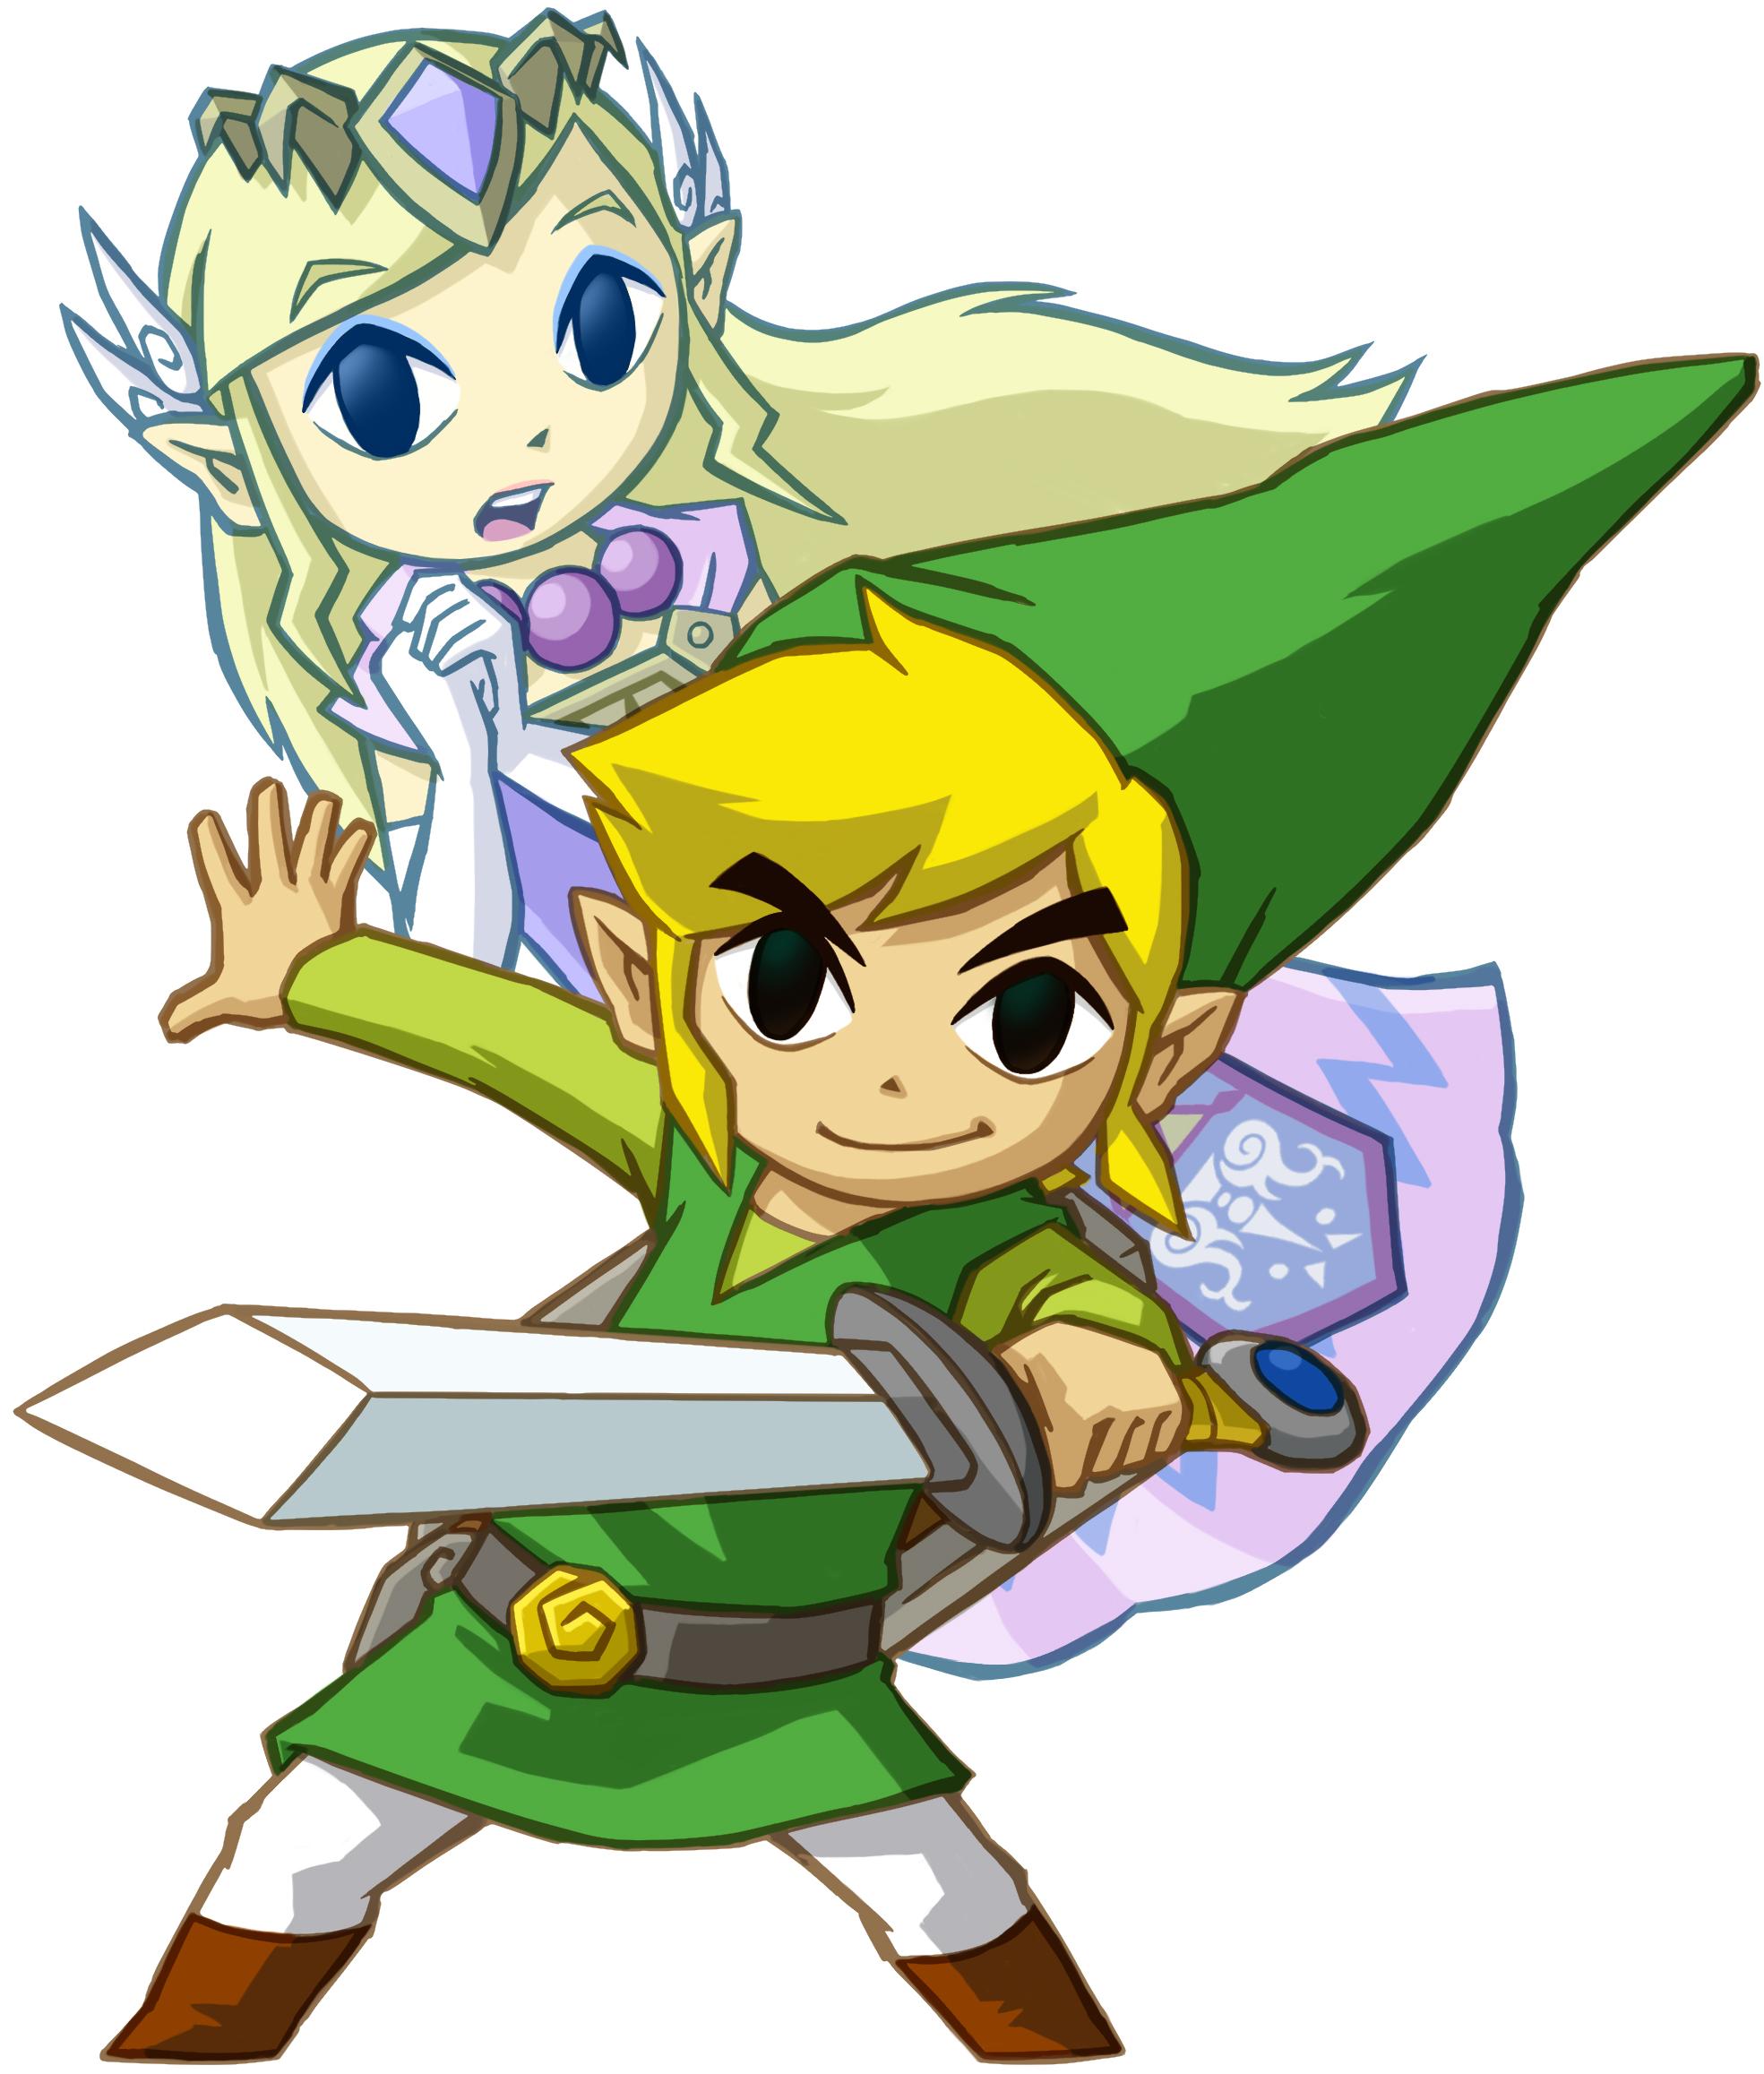 st link zeldapng - Link Et Zelda